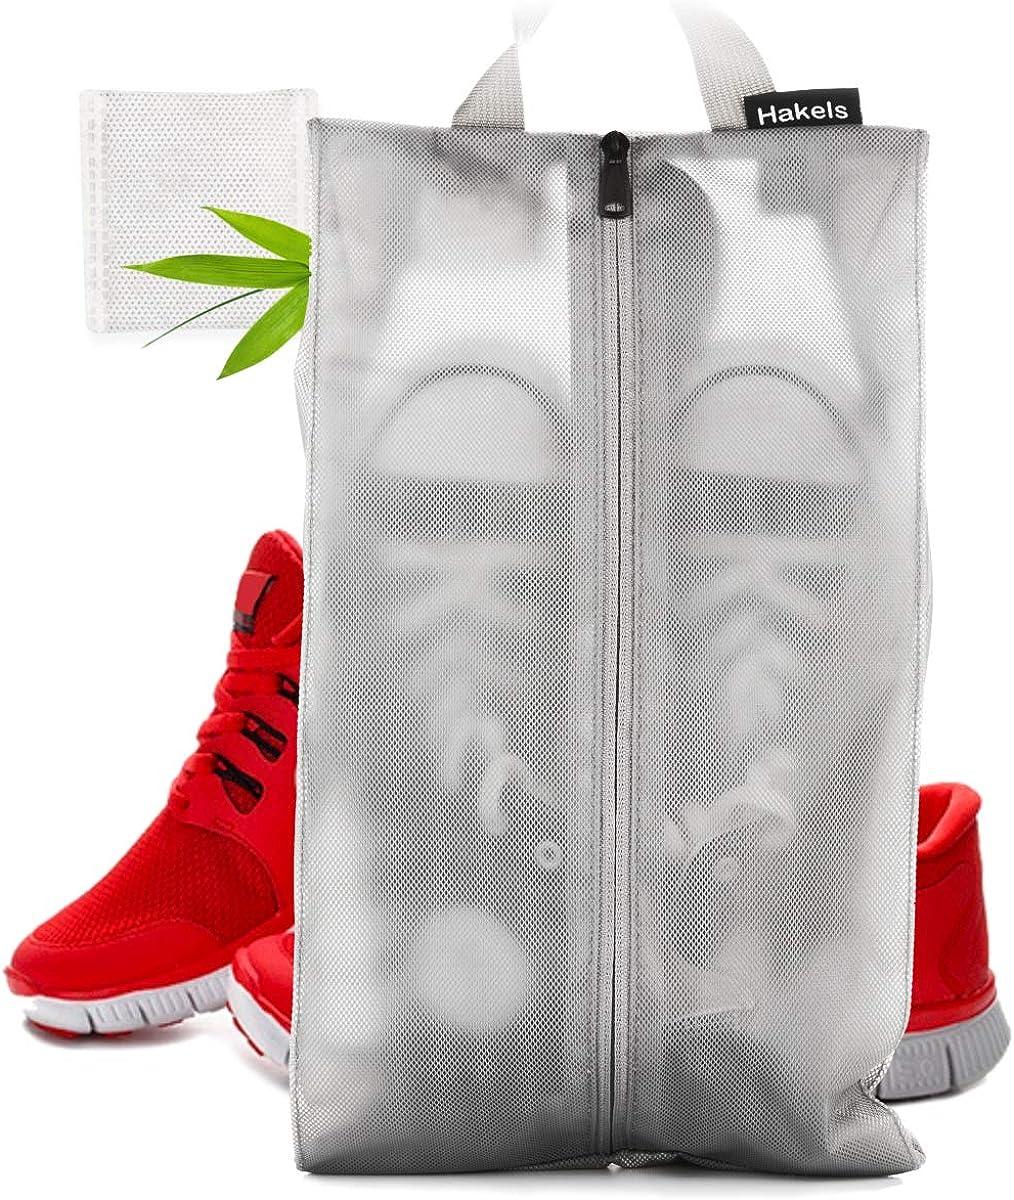 Shoe Bags for Travel, Odor Repellant Hygienic Luggage Packing Organizer, Water Resistant Sneaker Bag for Men & Women